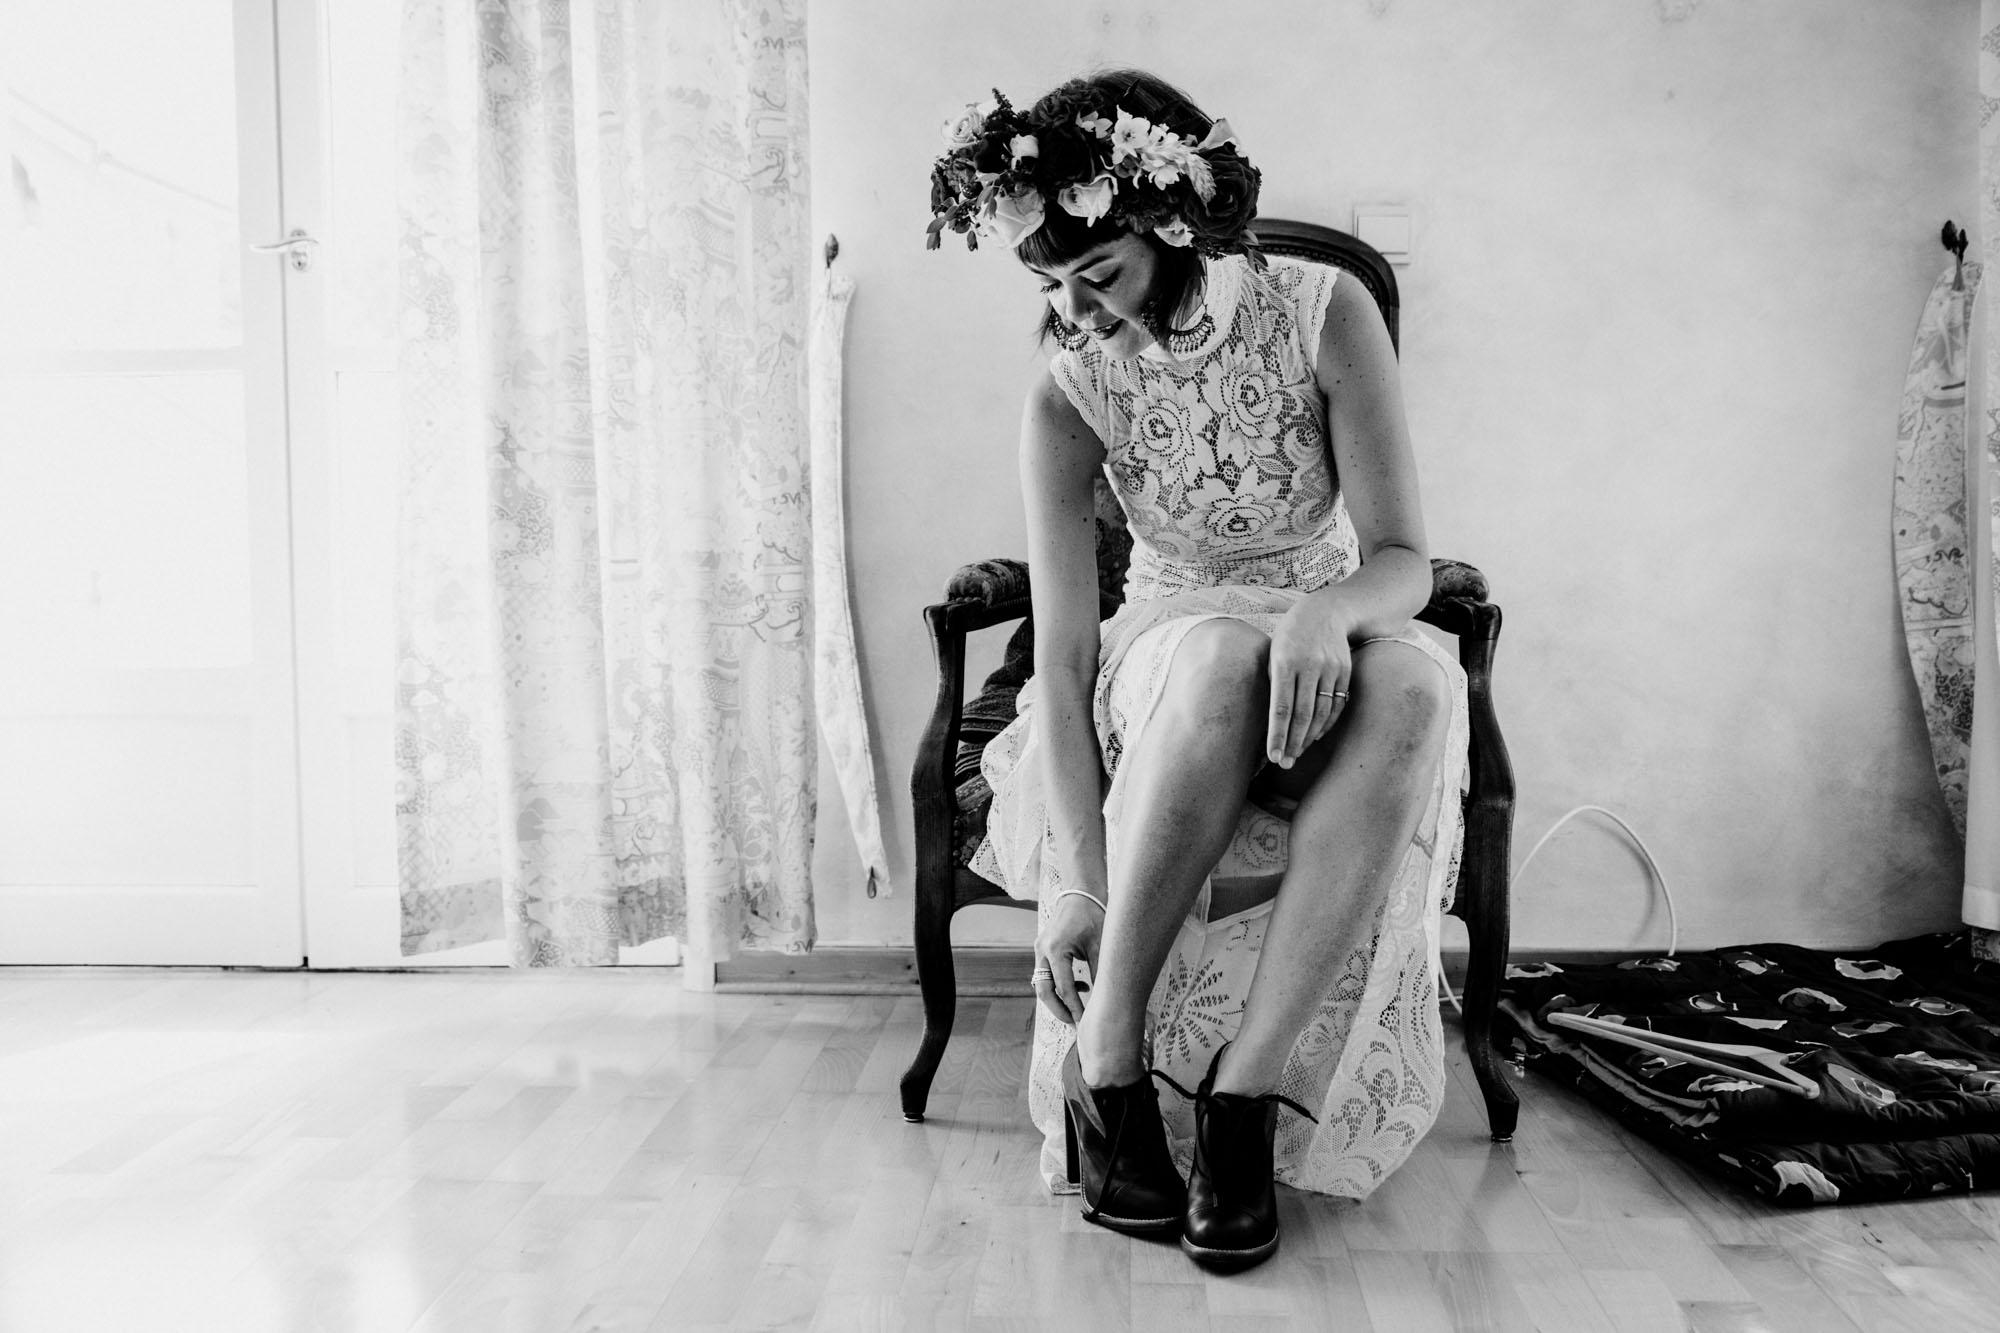 2018-08-04 - LD8_2591 - photographe mariage lyon - laurie diaz - www.lauriediazweeding.com.jpg